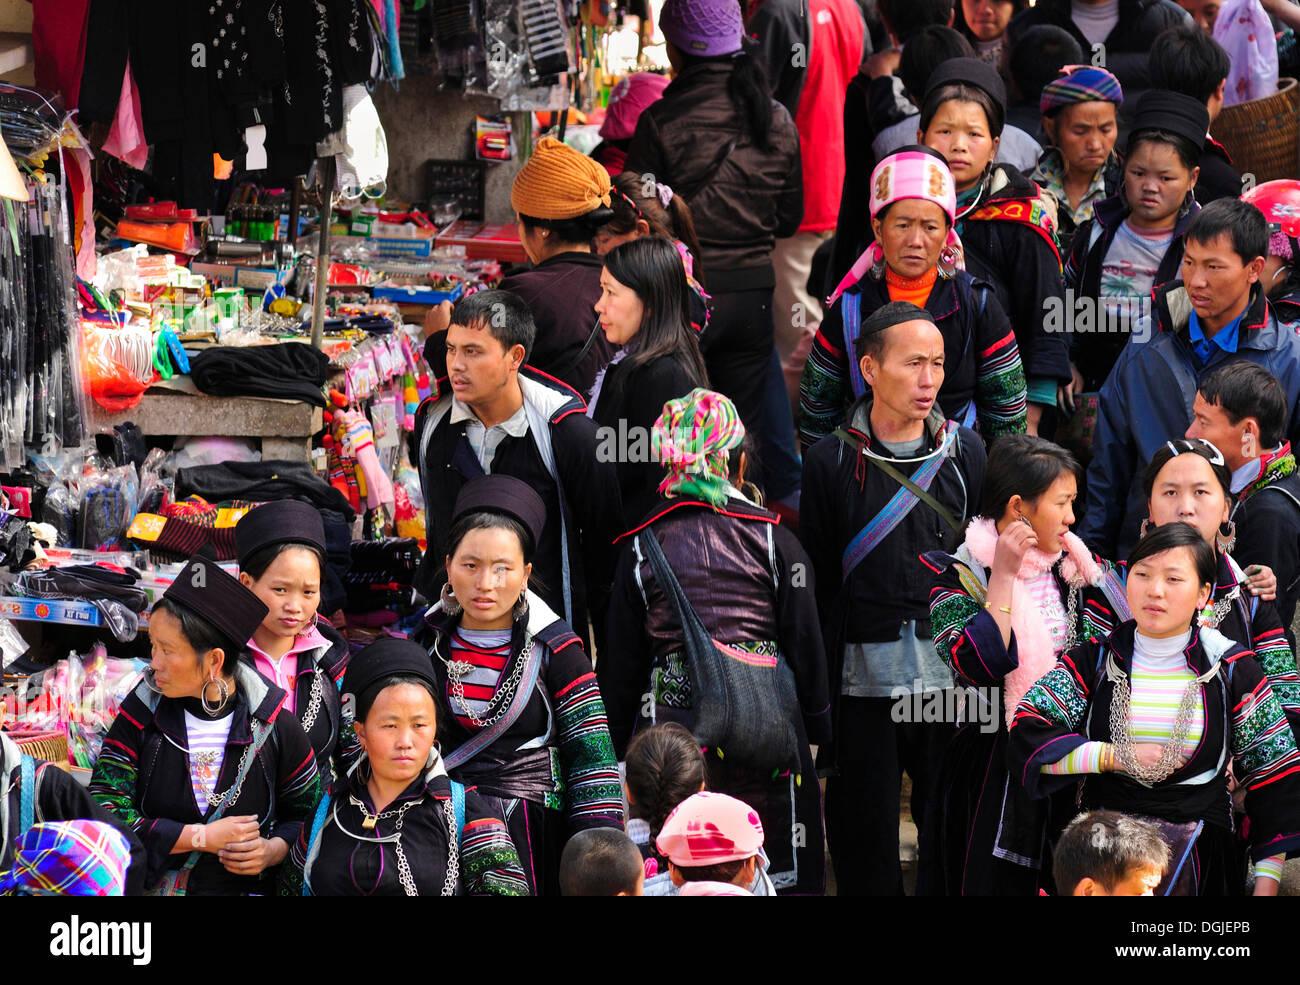 Market of Sa Pa or Sapa, Black Hmong ethnic minority group, North Vietnam, Vietnam, Asia - Stock Image